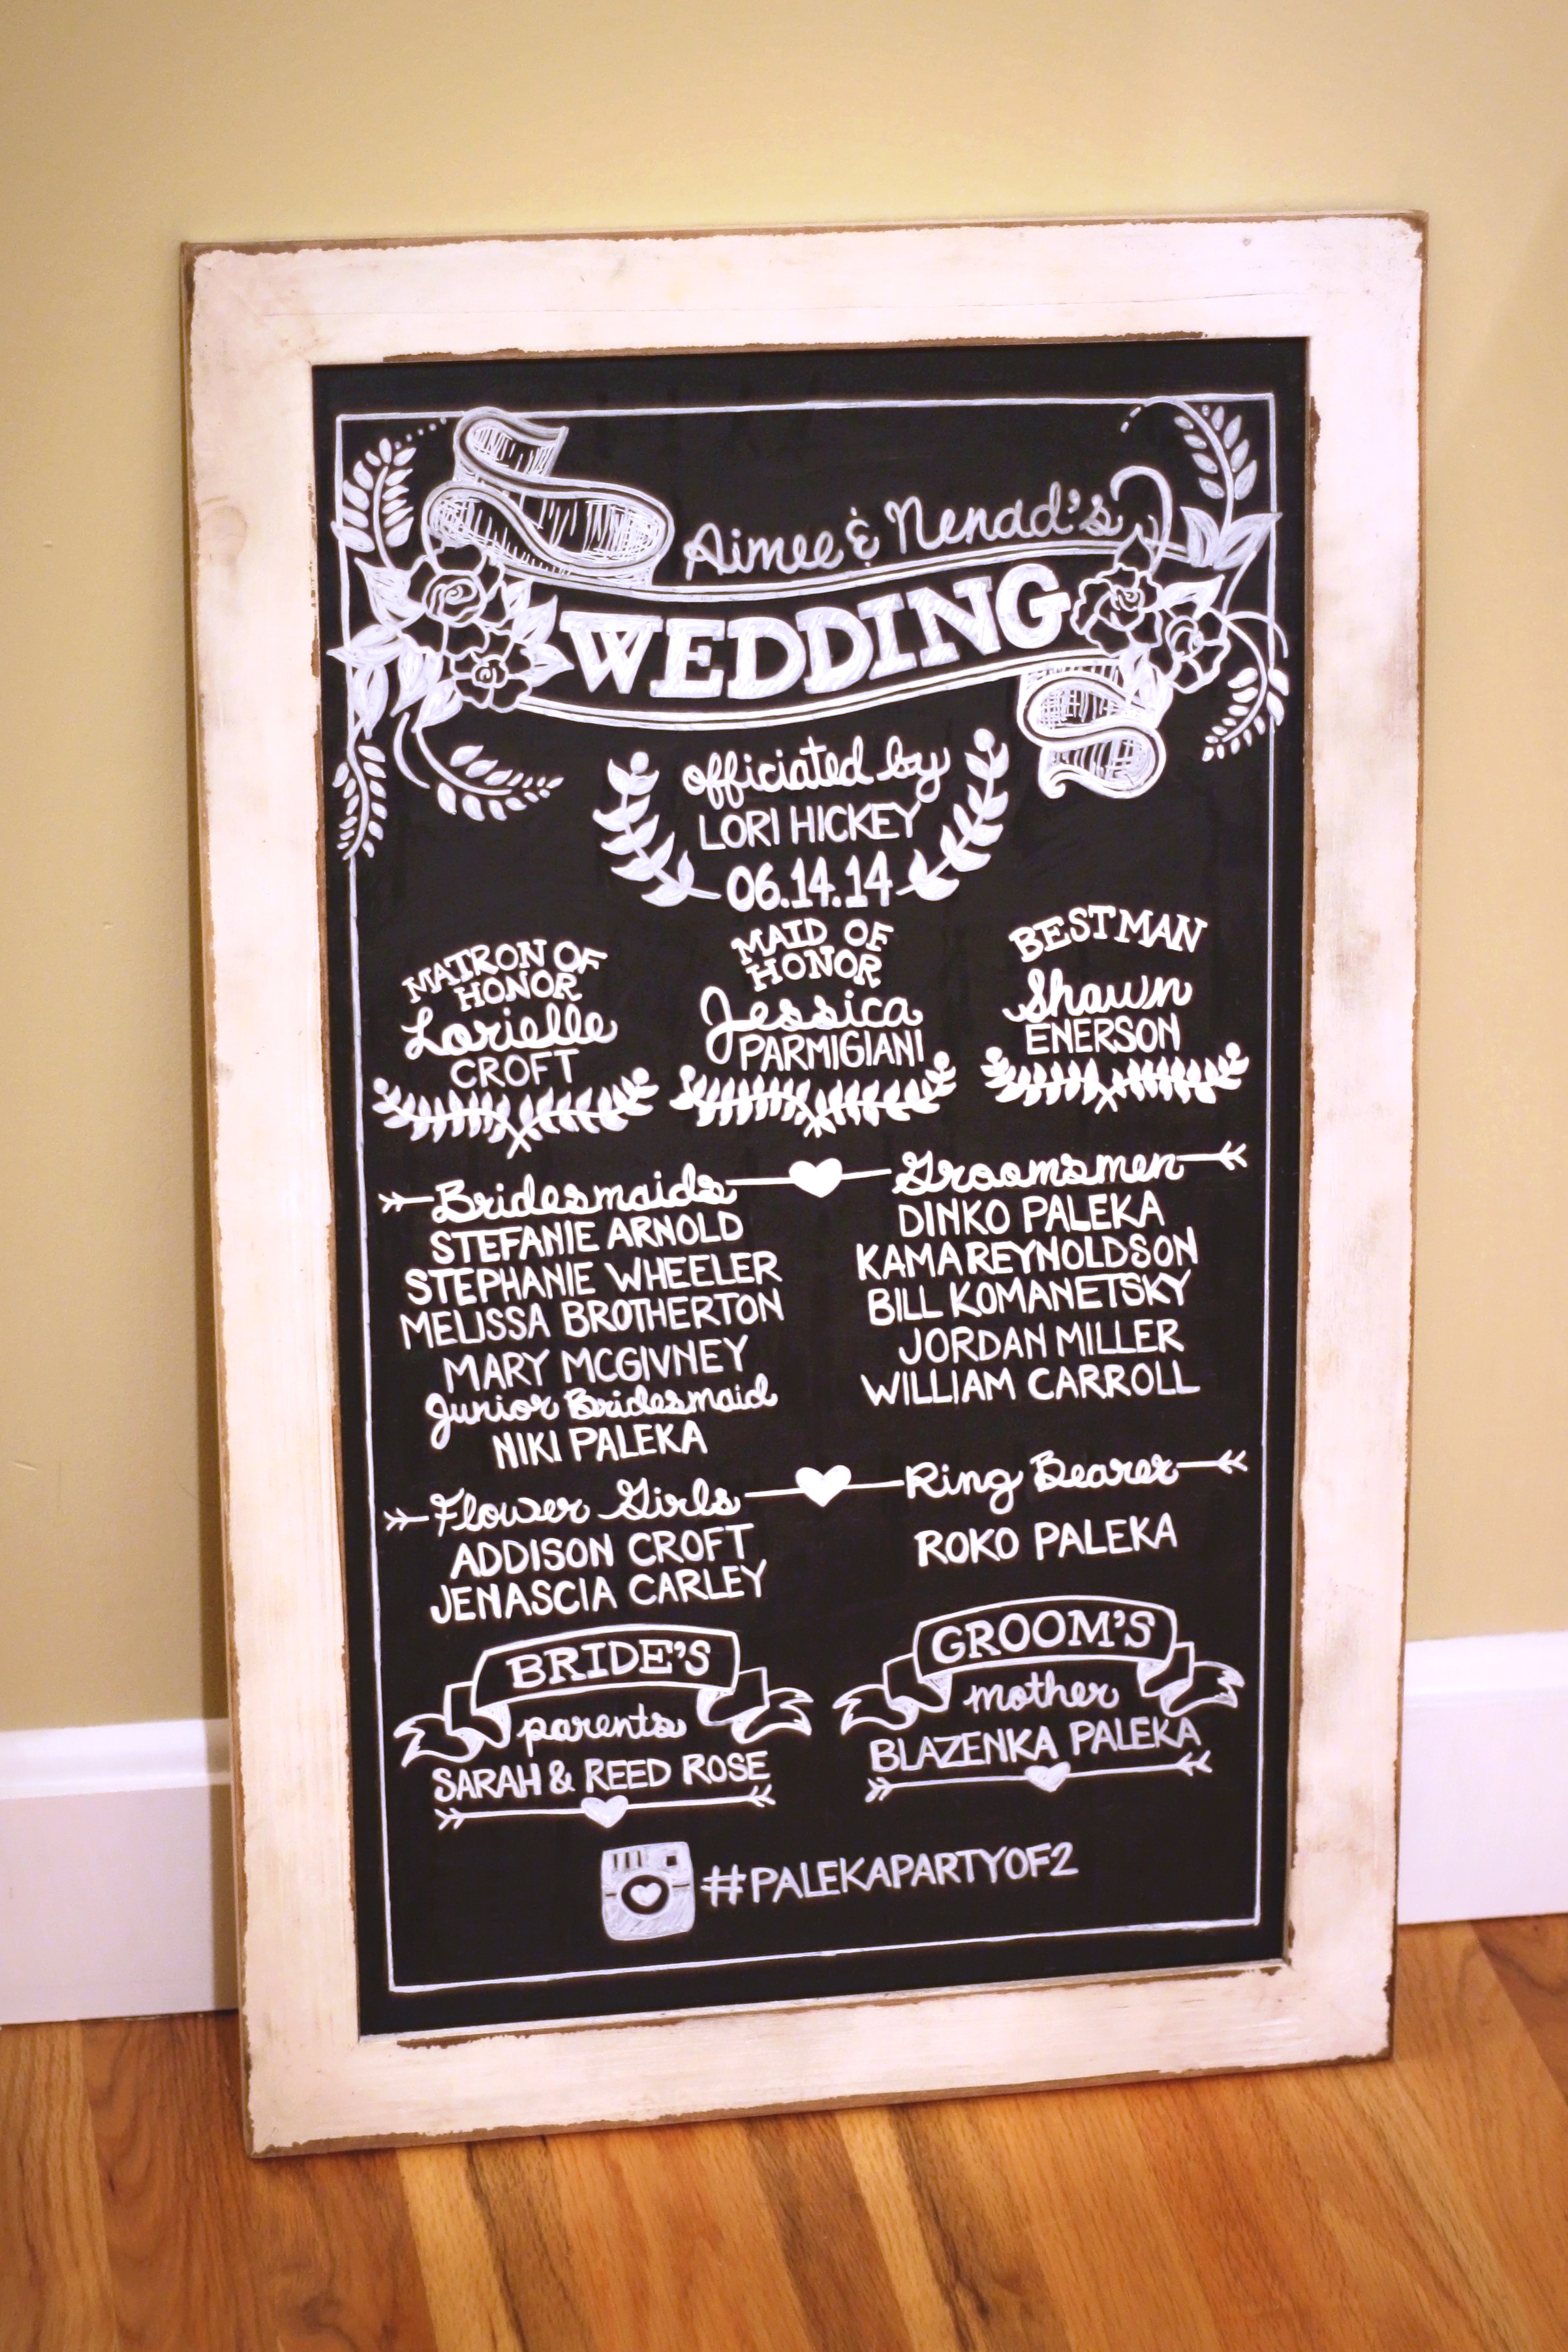 Aime_wed_chalkboard.jpg